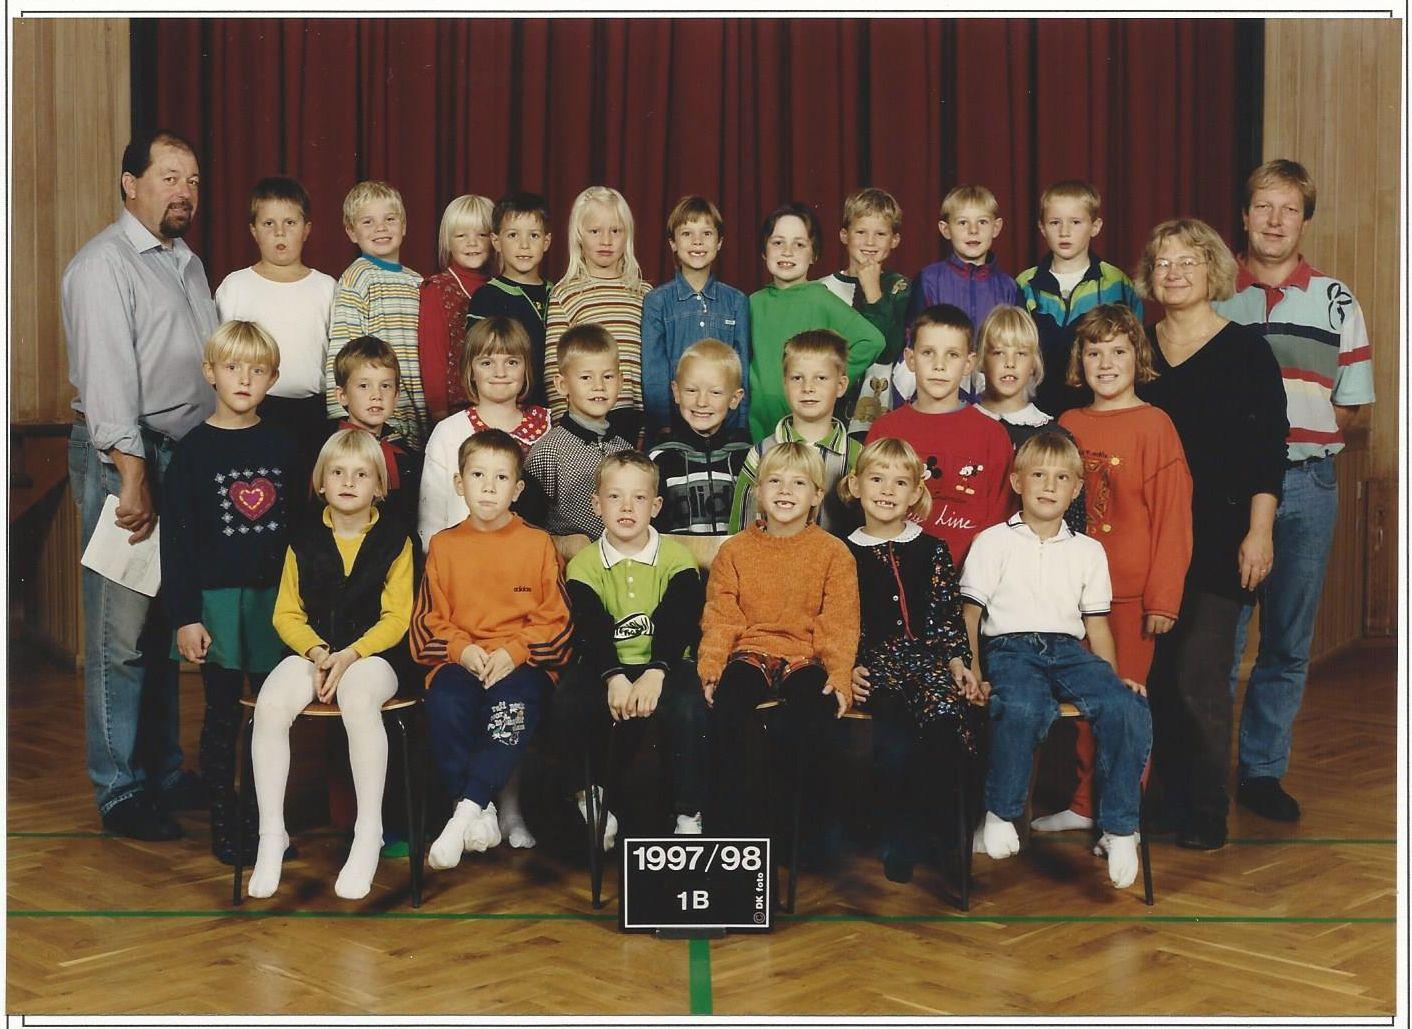 1997-1b